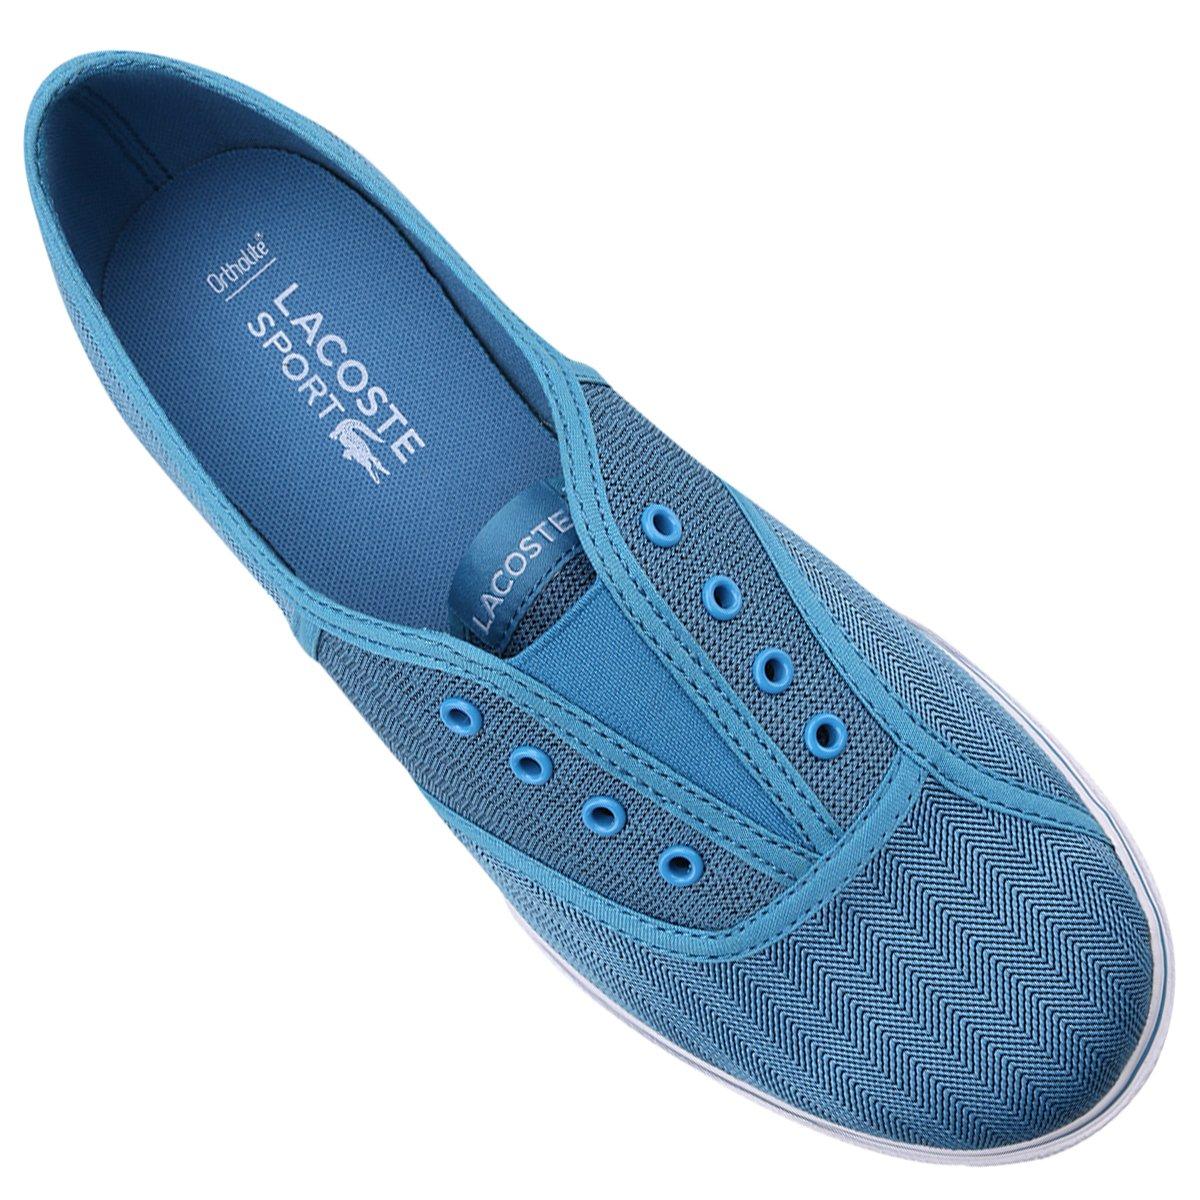 Tênis Lacoste Rene Sleek Slip Hpc - Azul Piscina e Branco - Compre ... a18b003dc8